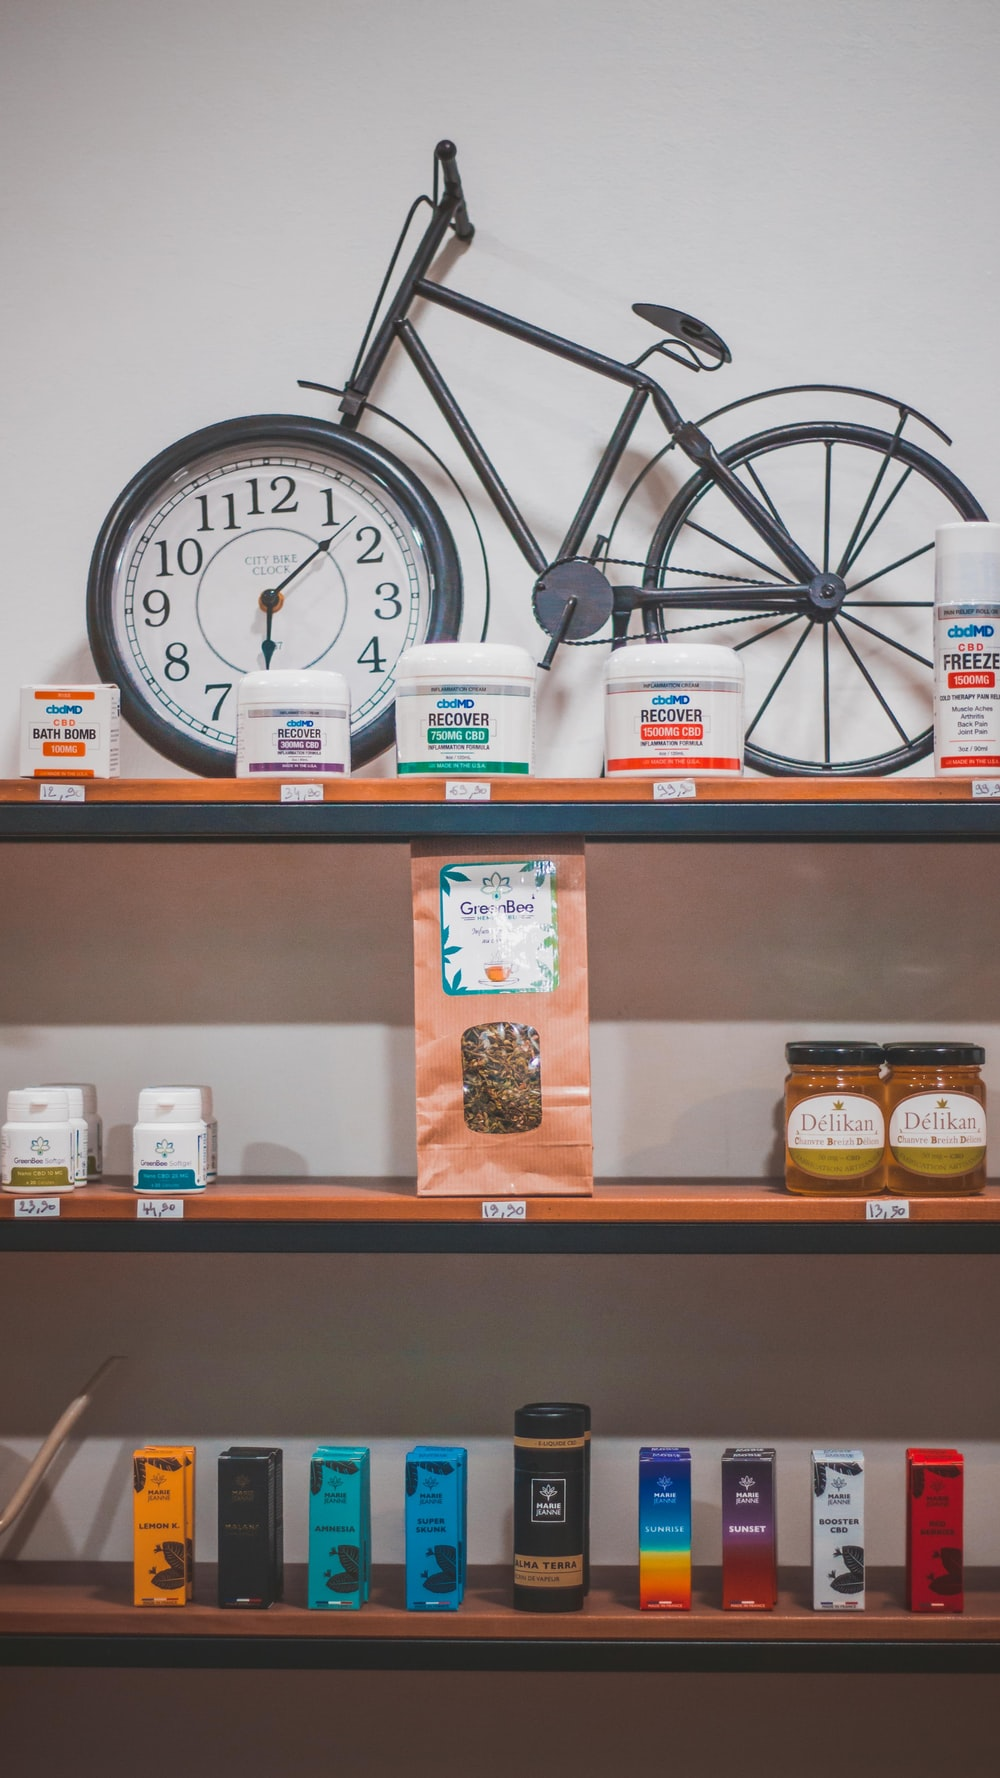 black bicycle analog clock on shelf